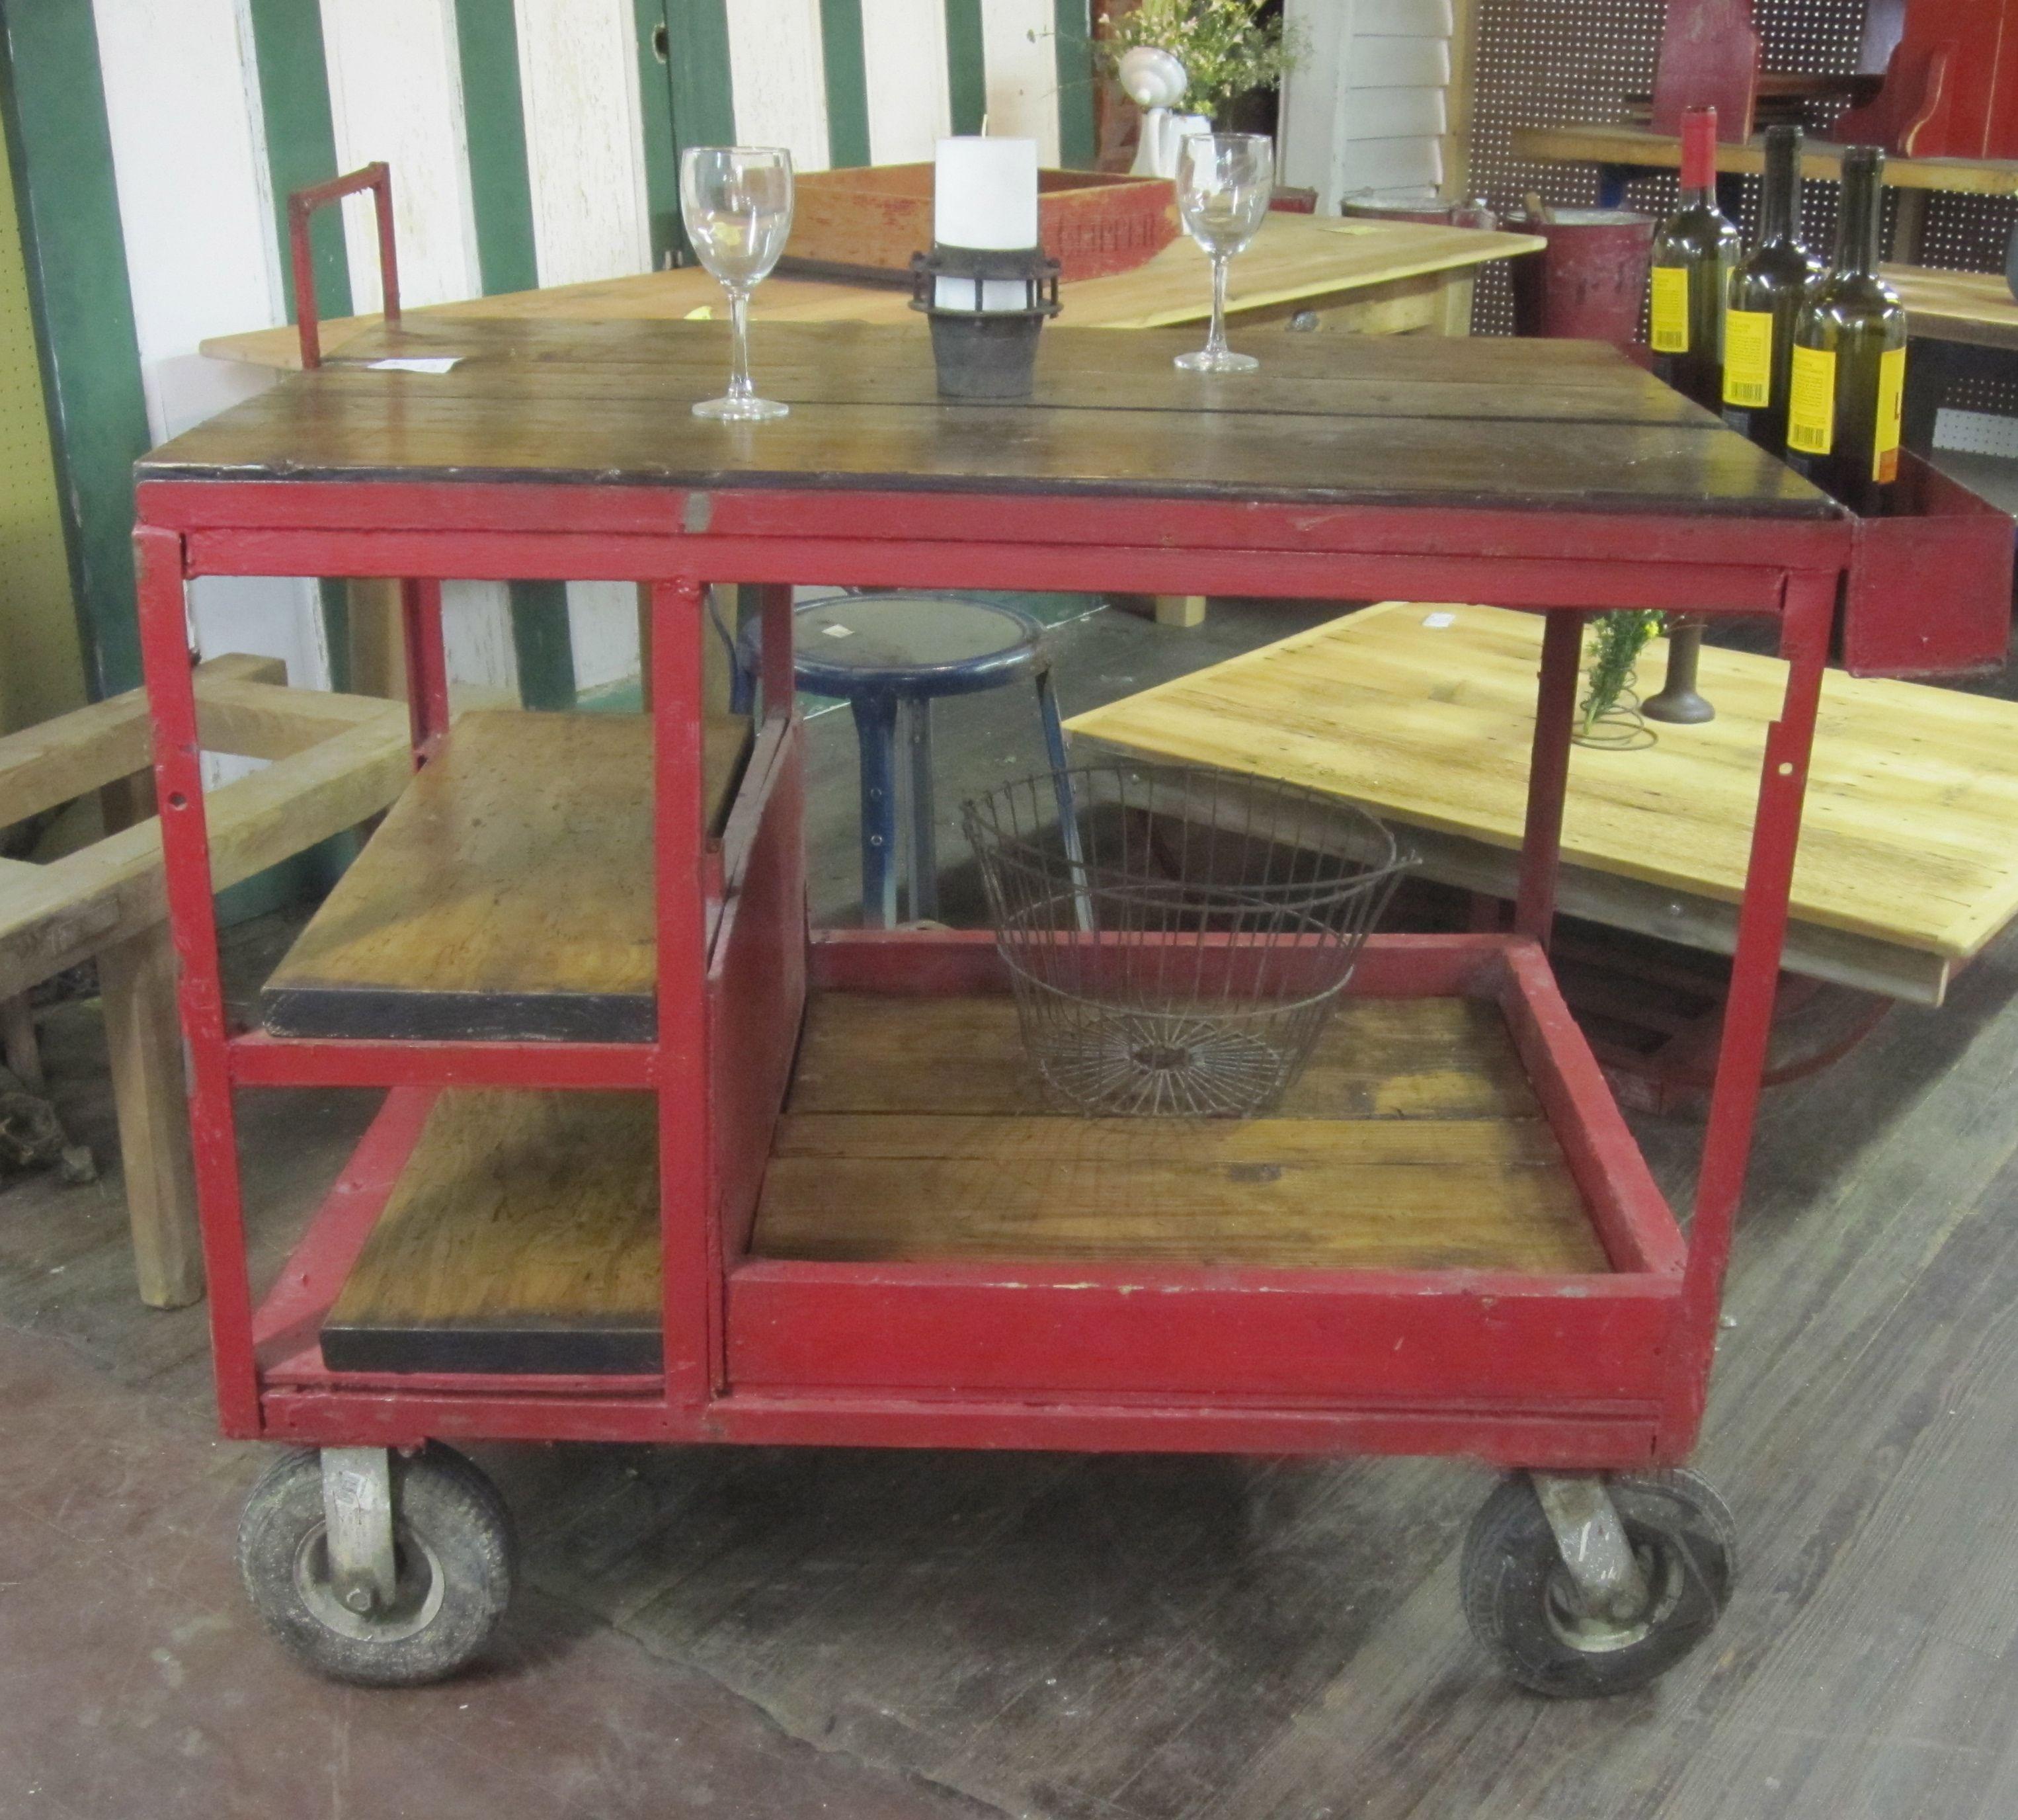 Urban Metal Kitchen Cart: Repurposed Industrial Cart - Google Search